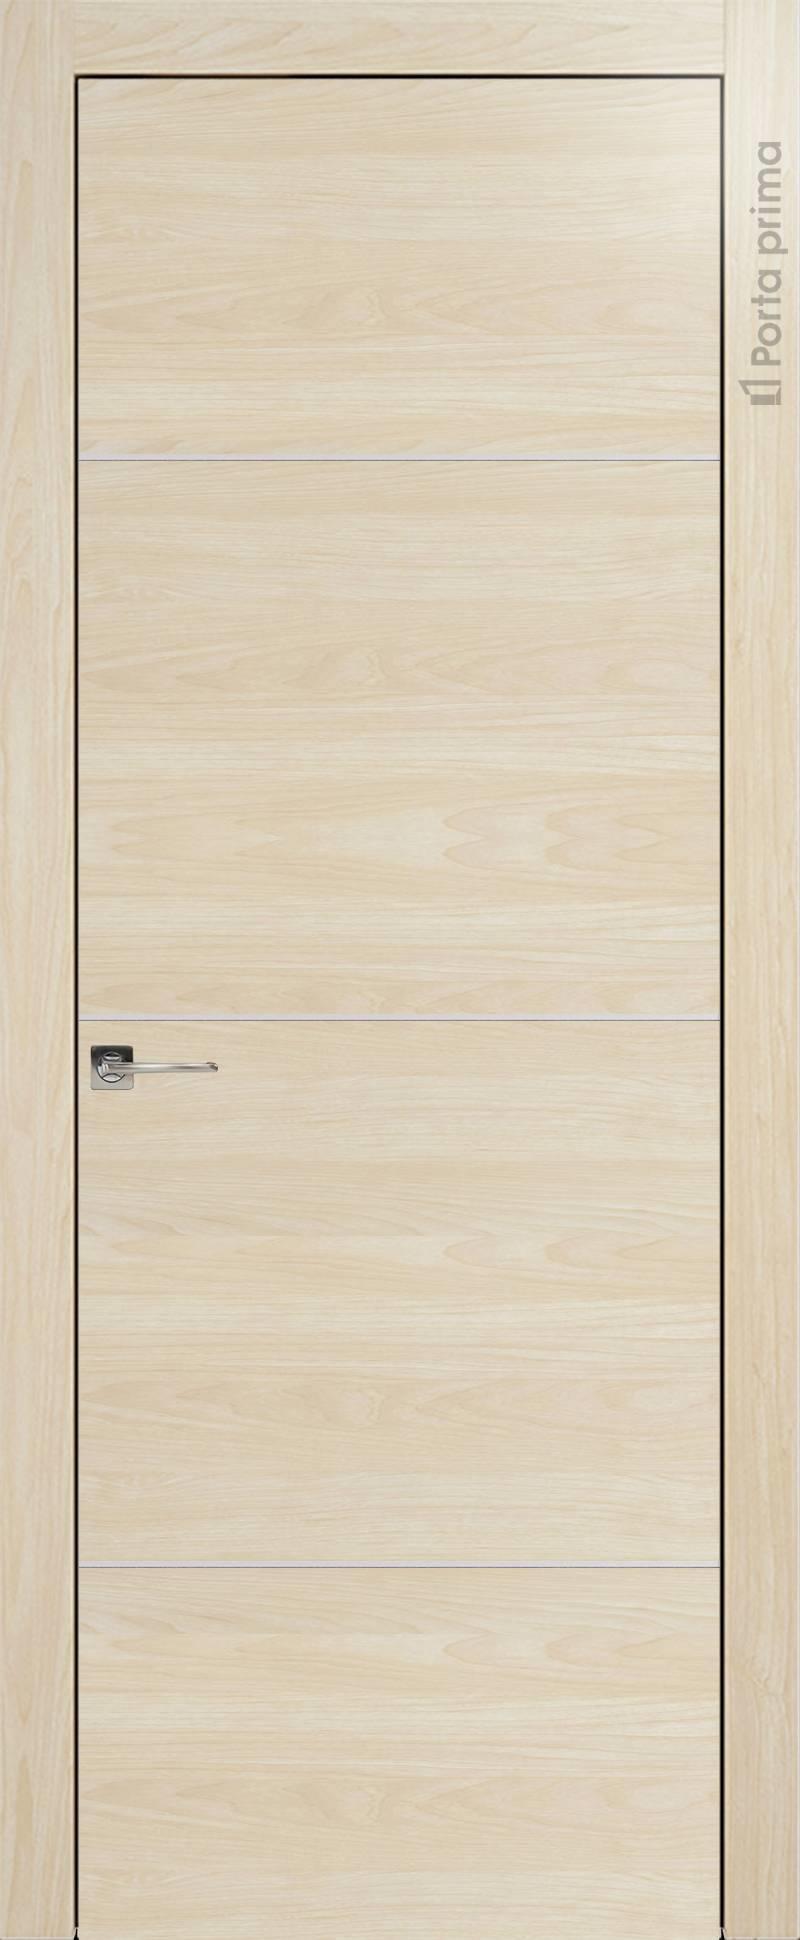 Tivoli Г-3 цвет - Клен Без стекла (ДГ)